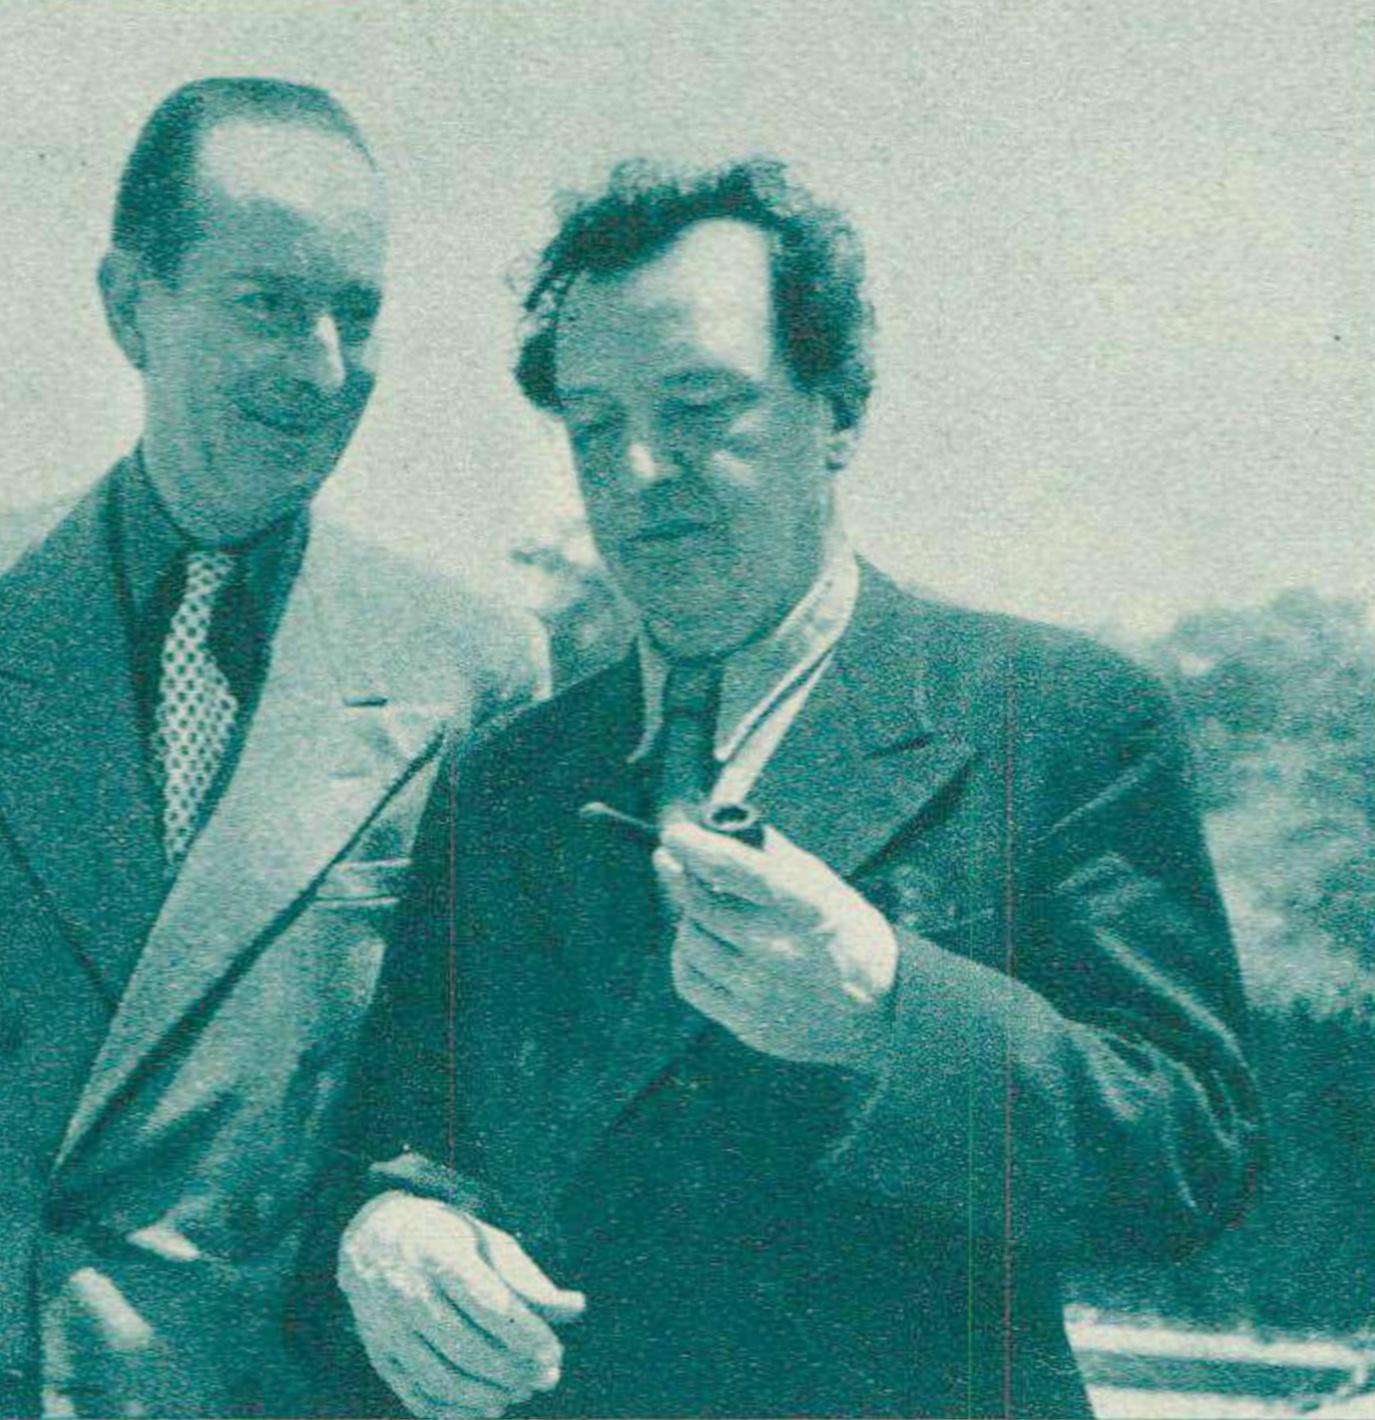 William AGUET et Arthur HONEGGER